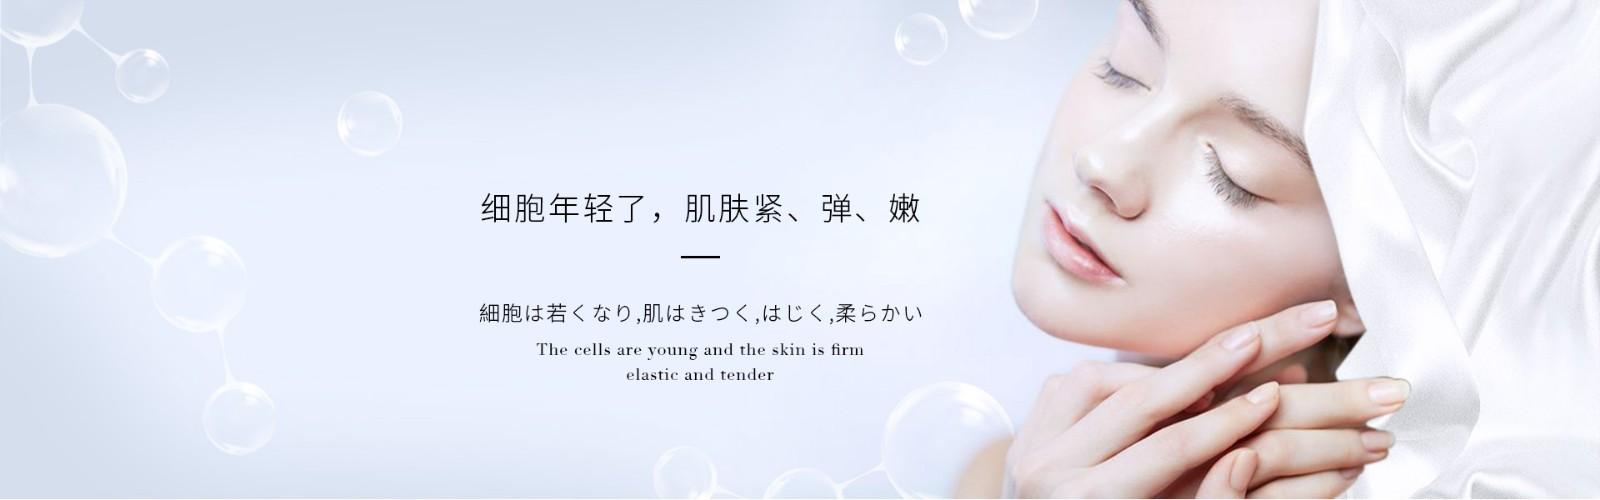 AGG产品banner2